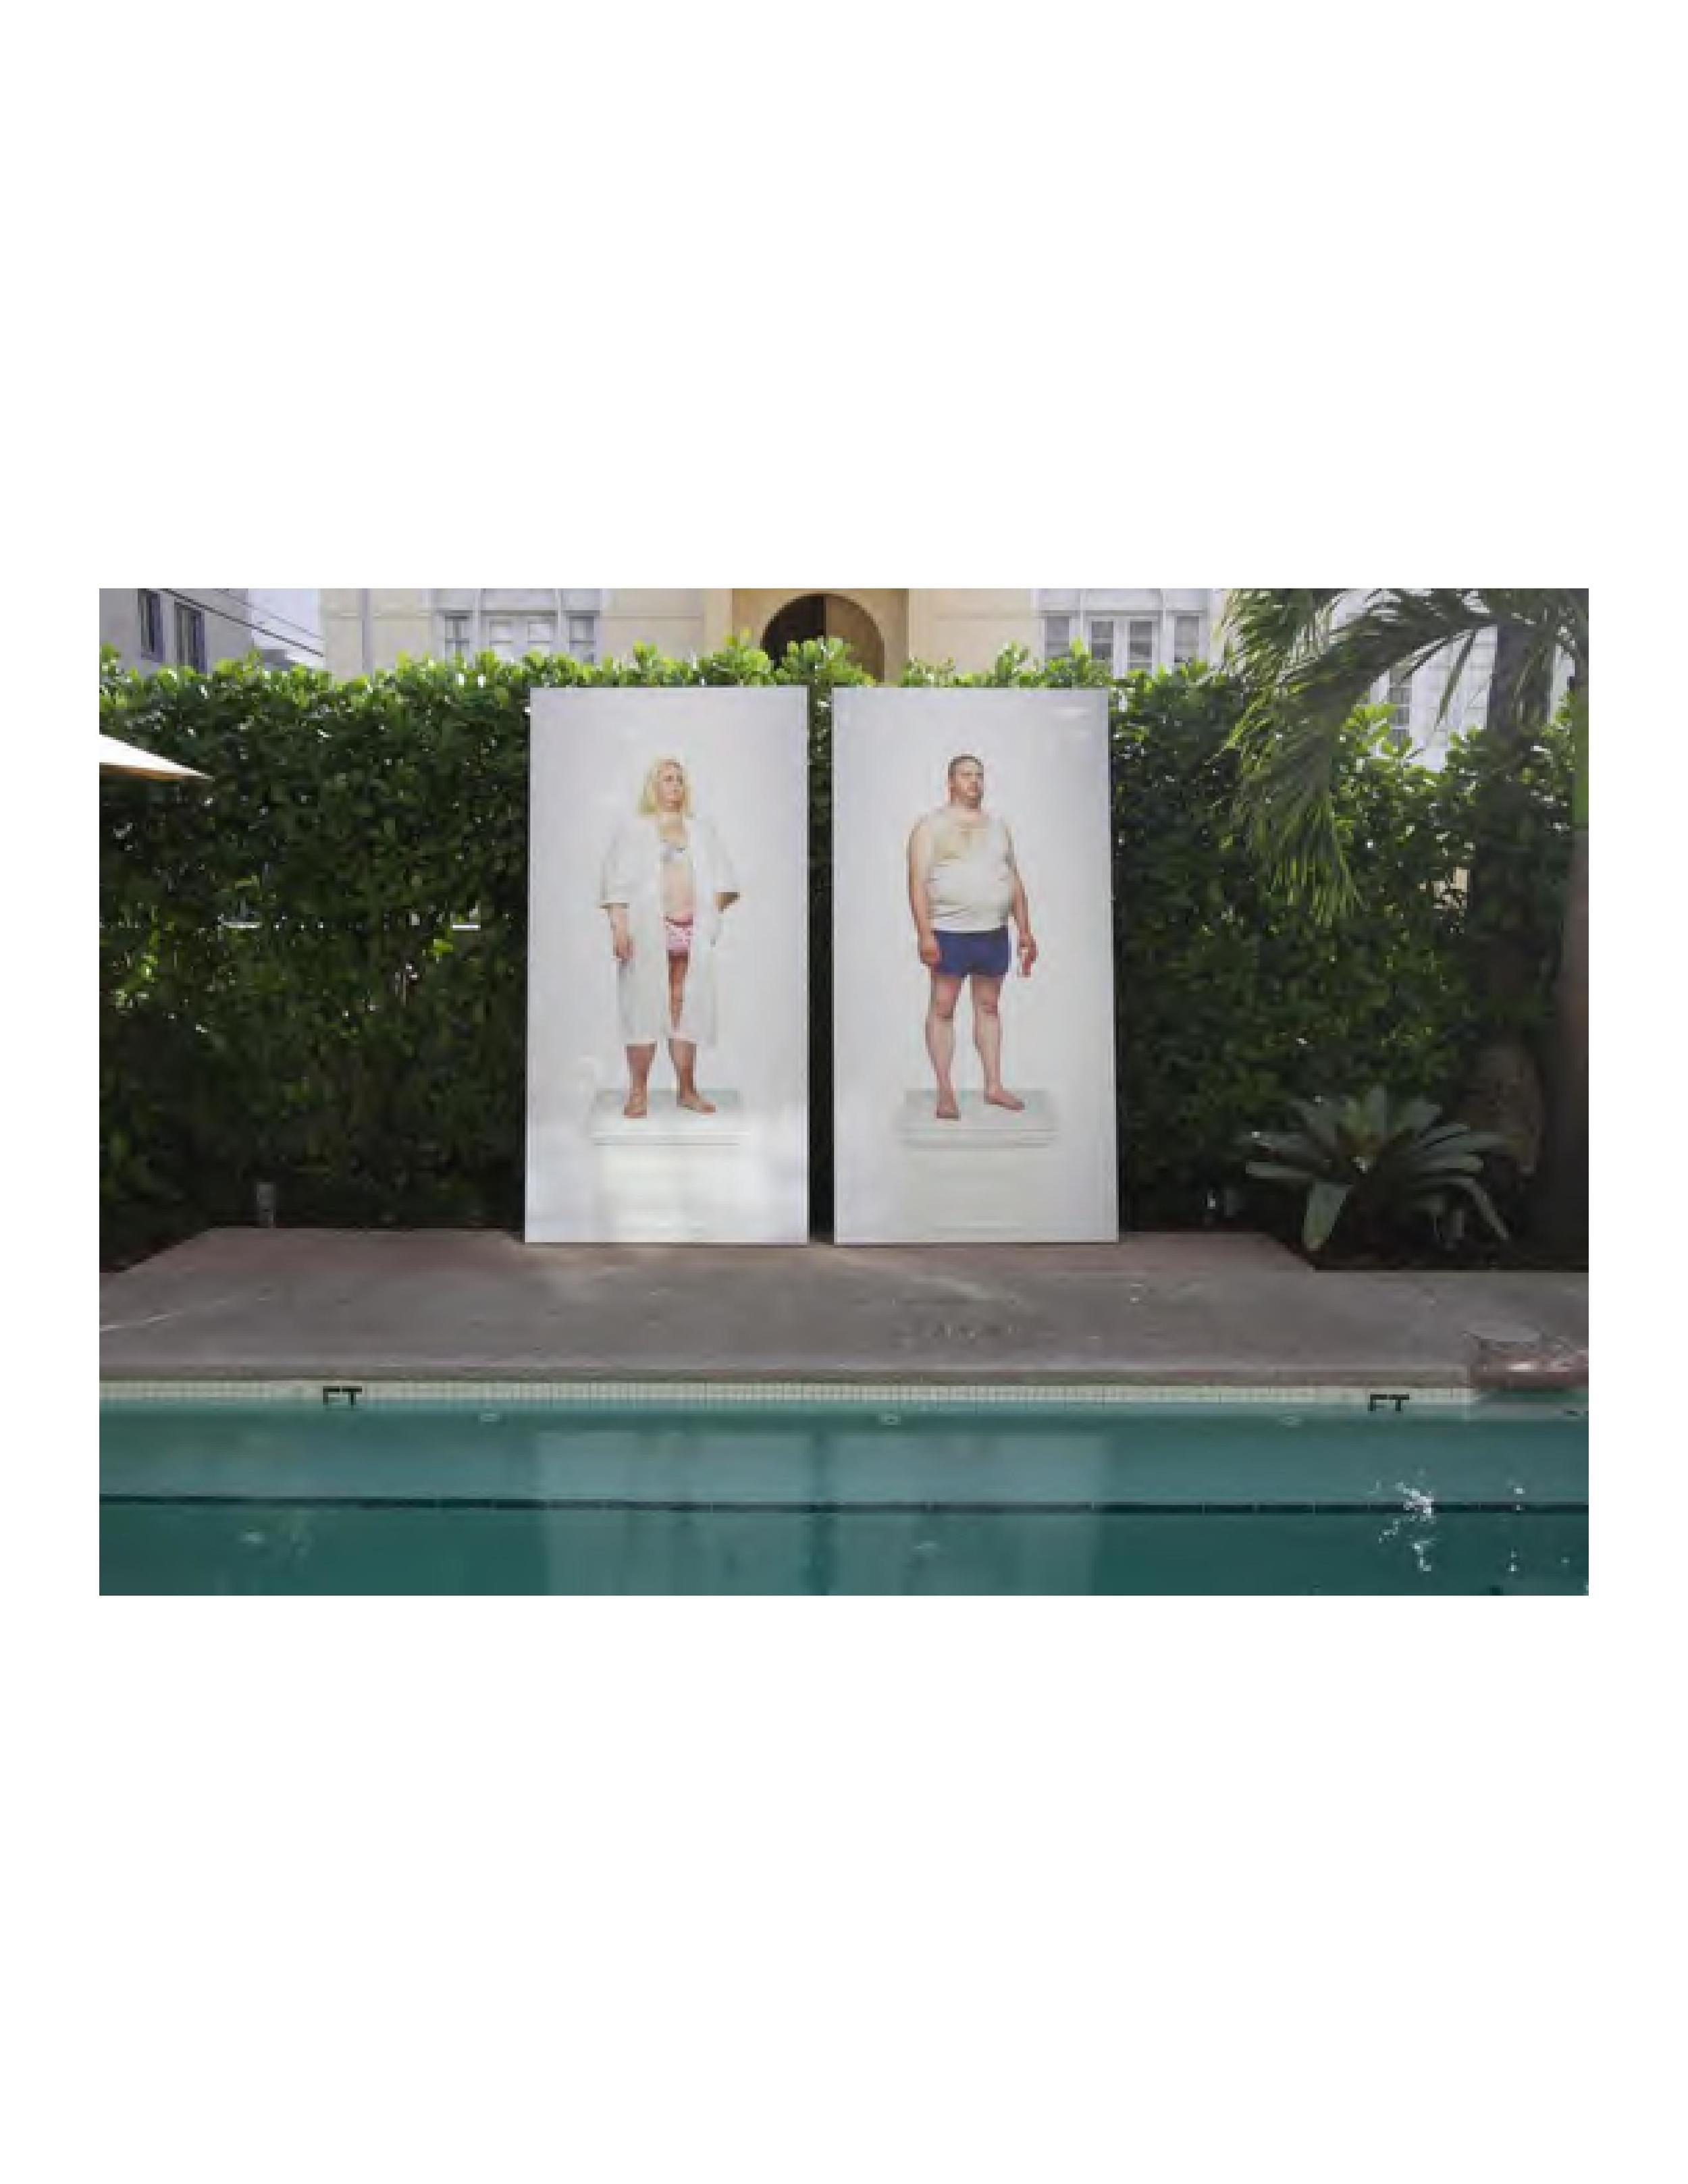 Miami_Art_Basel_Photographs-web-page-083.jpg